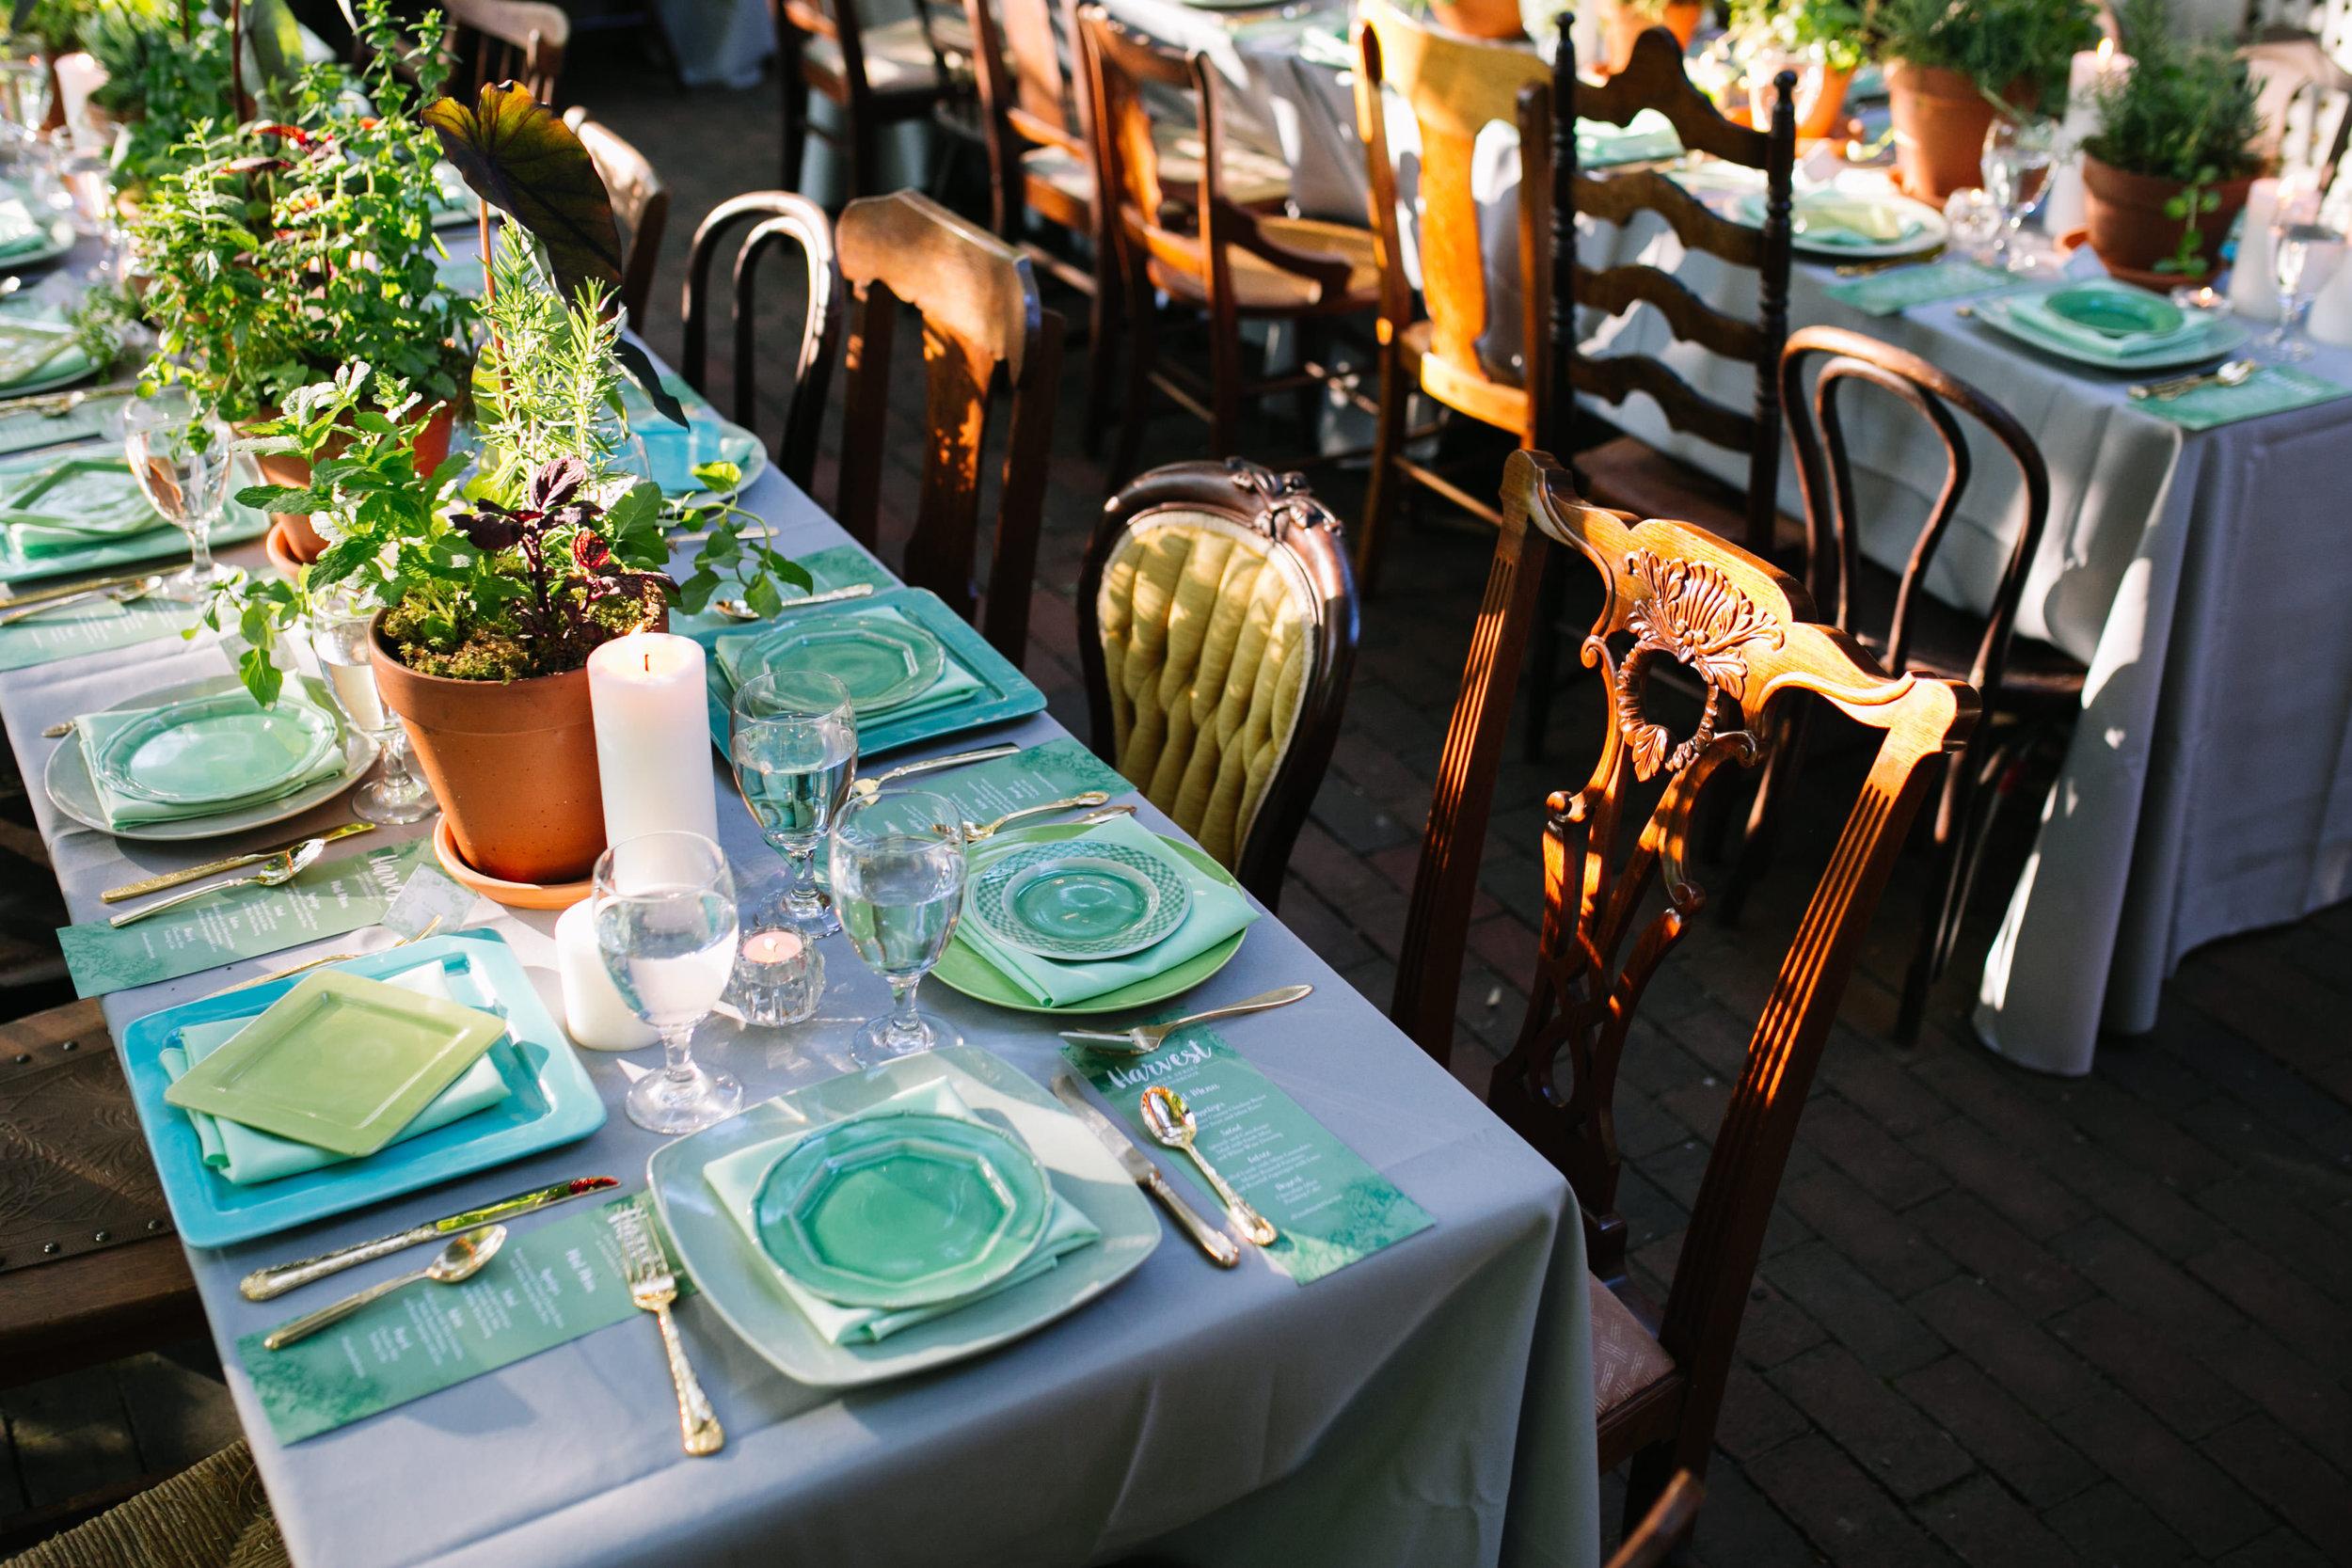 West-Chester-PA-Faunbrook-Harvest-Dinner-Series-Mint-BrittneyRaine-113.JPG